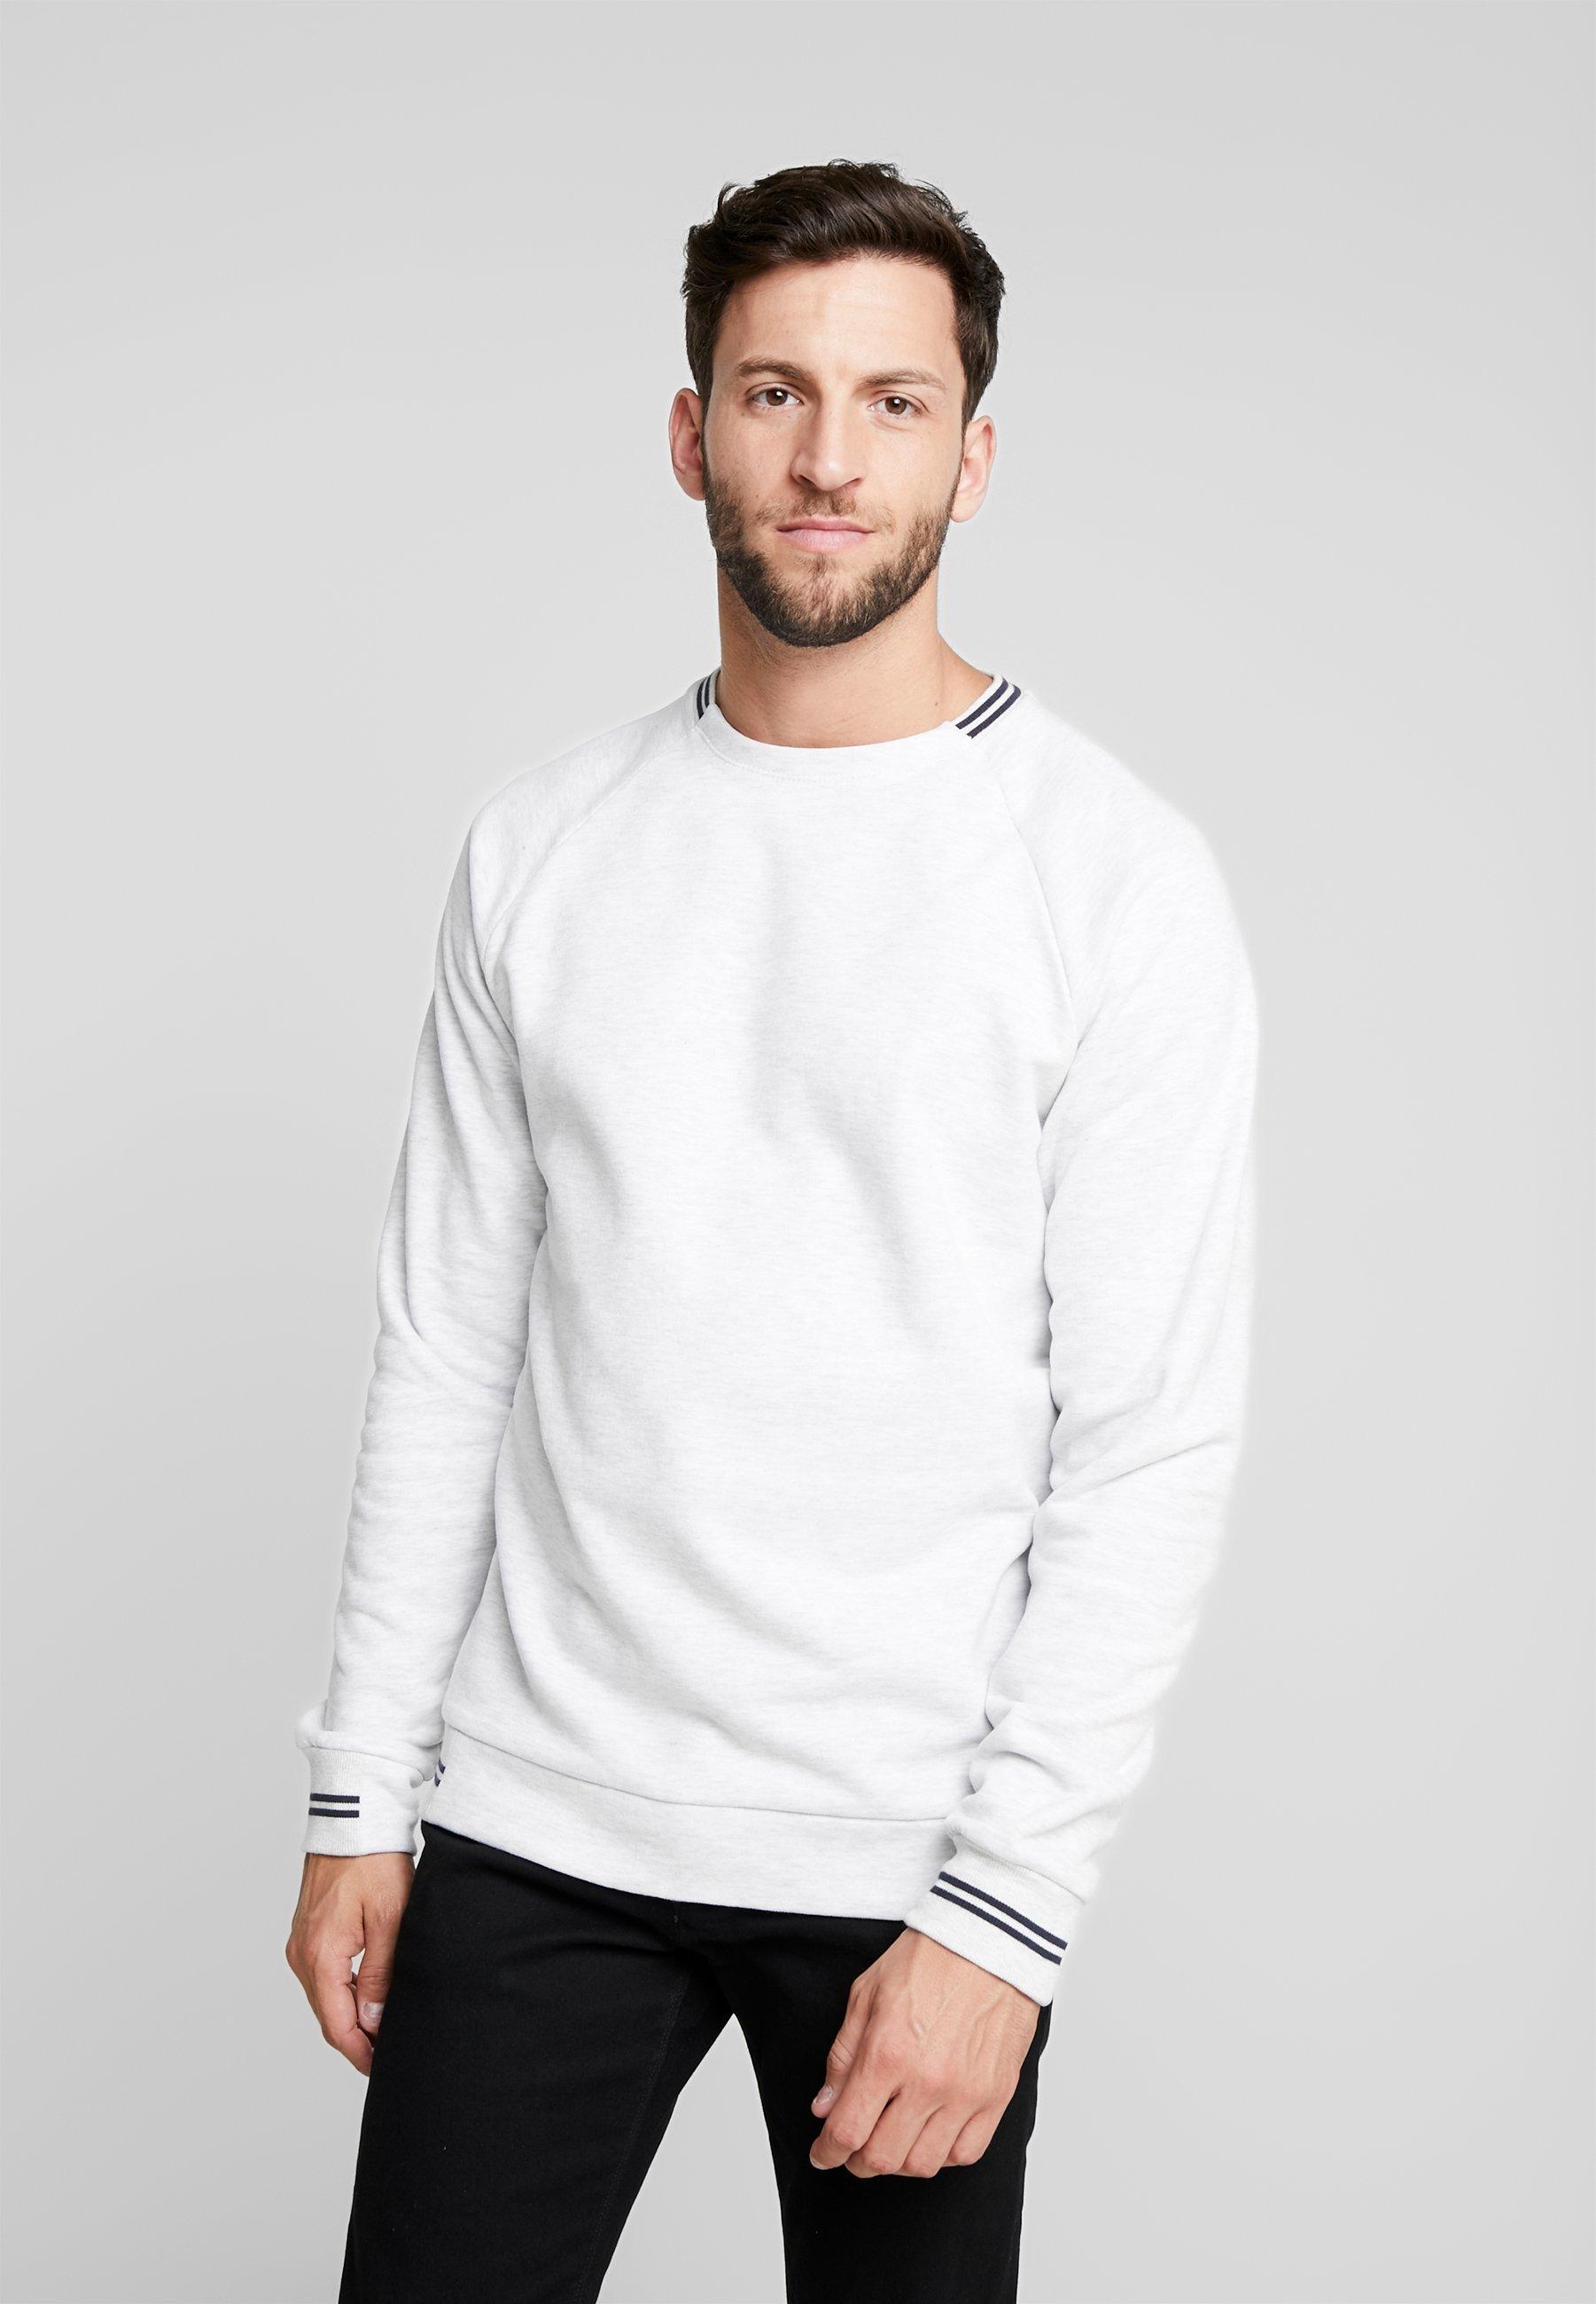 Edc Esprit By Esprit Edc White SweatshirtOff By Edc White SweatshirtOff rCBoQtsxhd